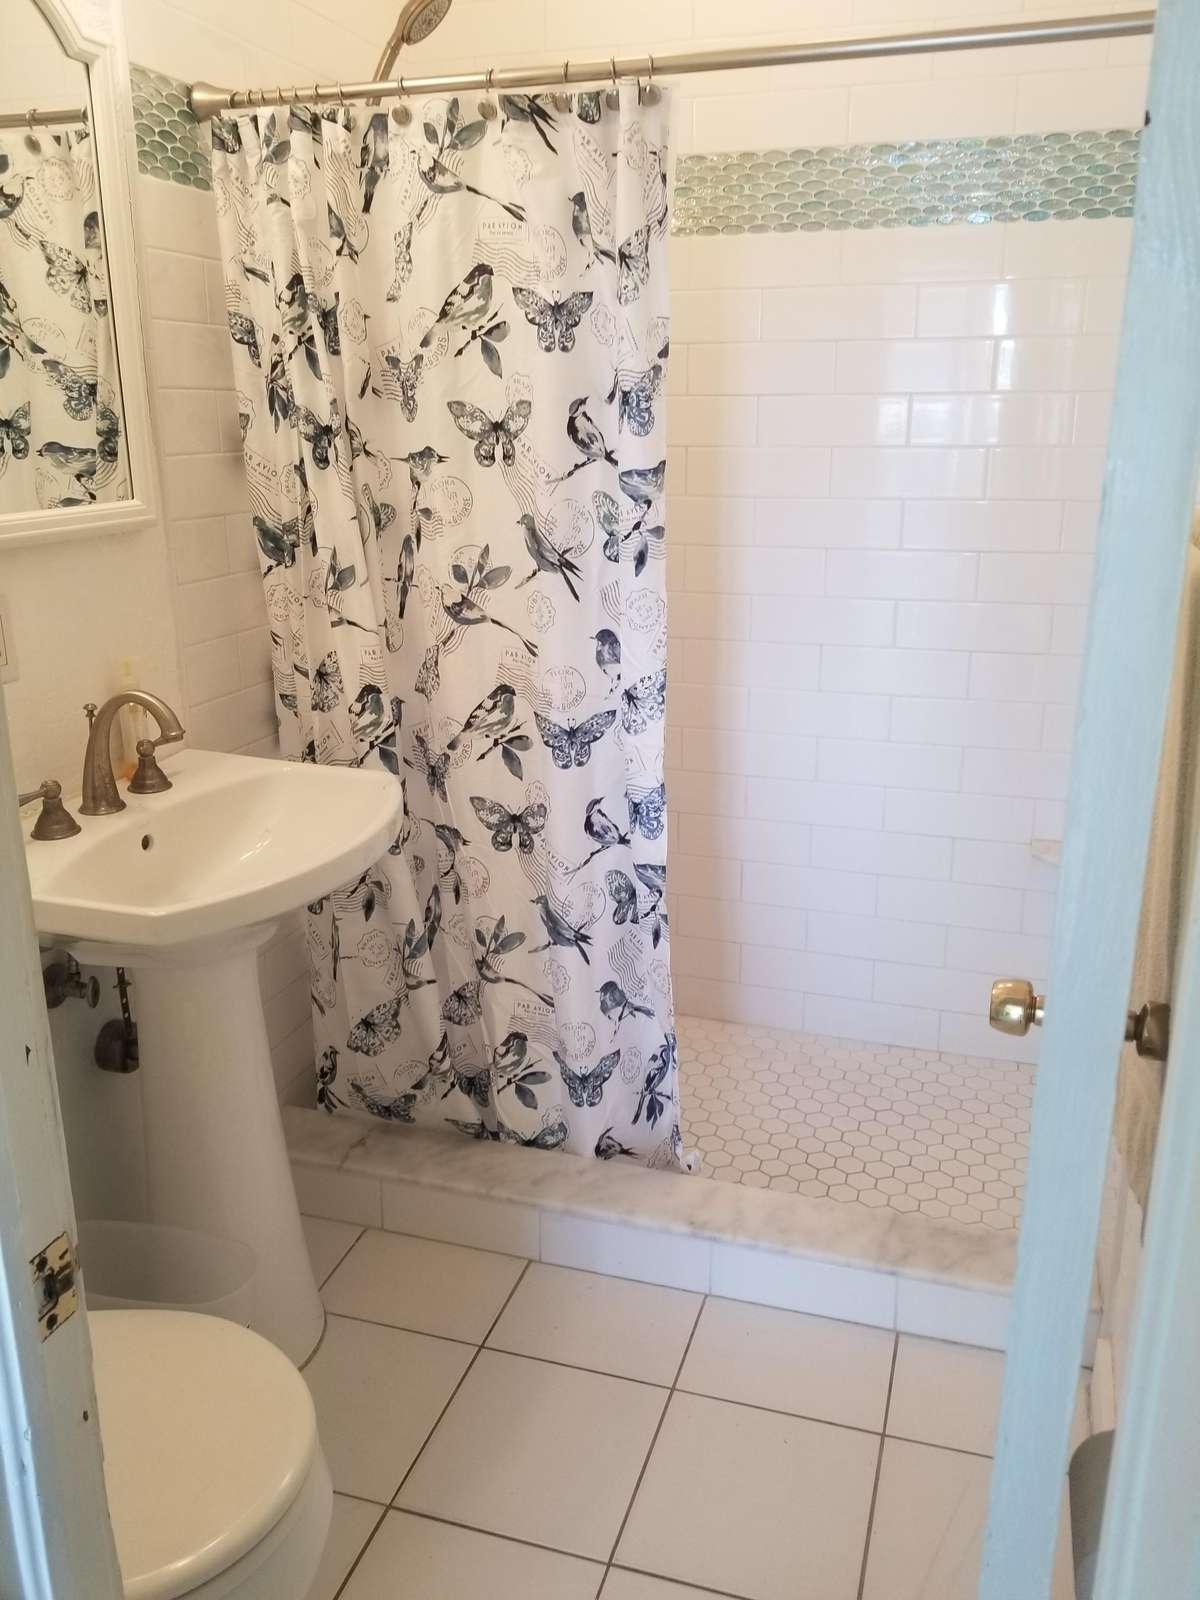 Bath with shower is in the hallway between the 2 bedrooms